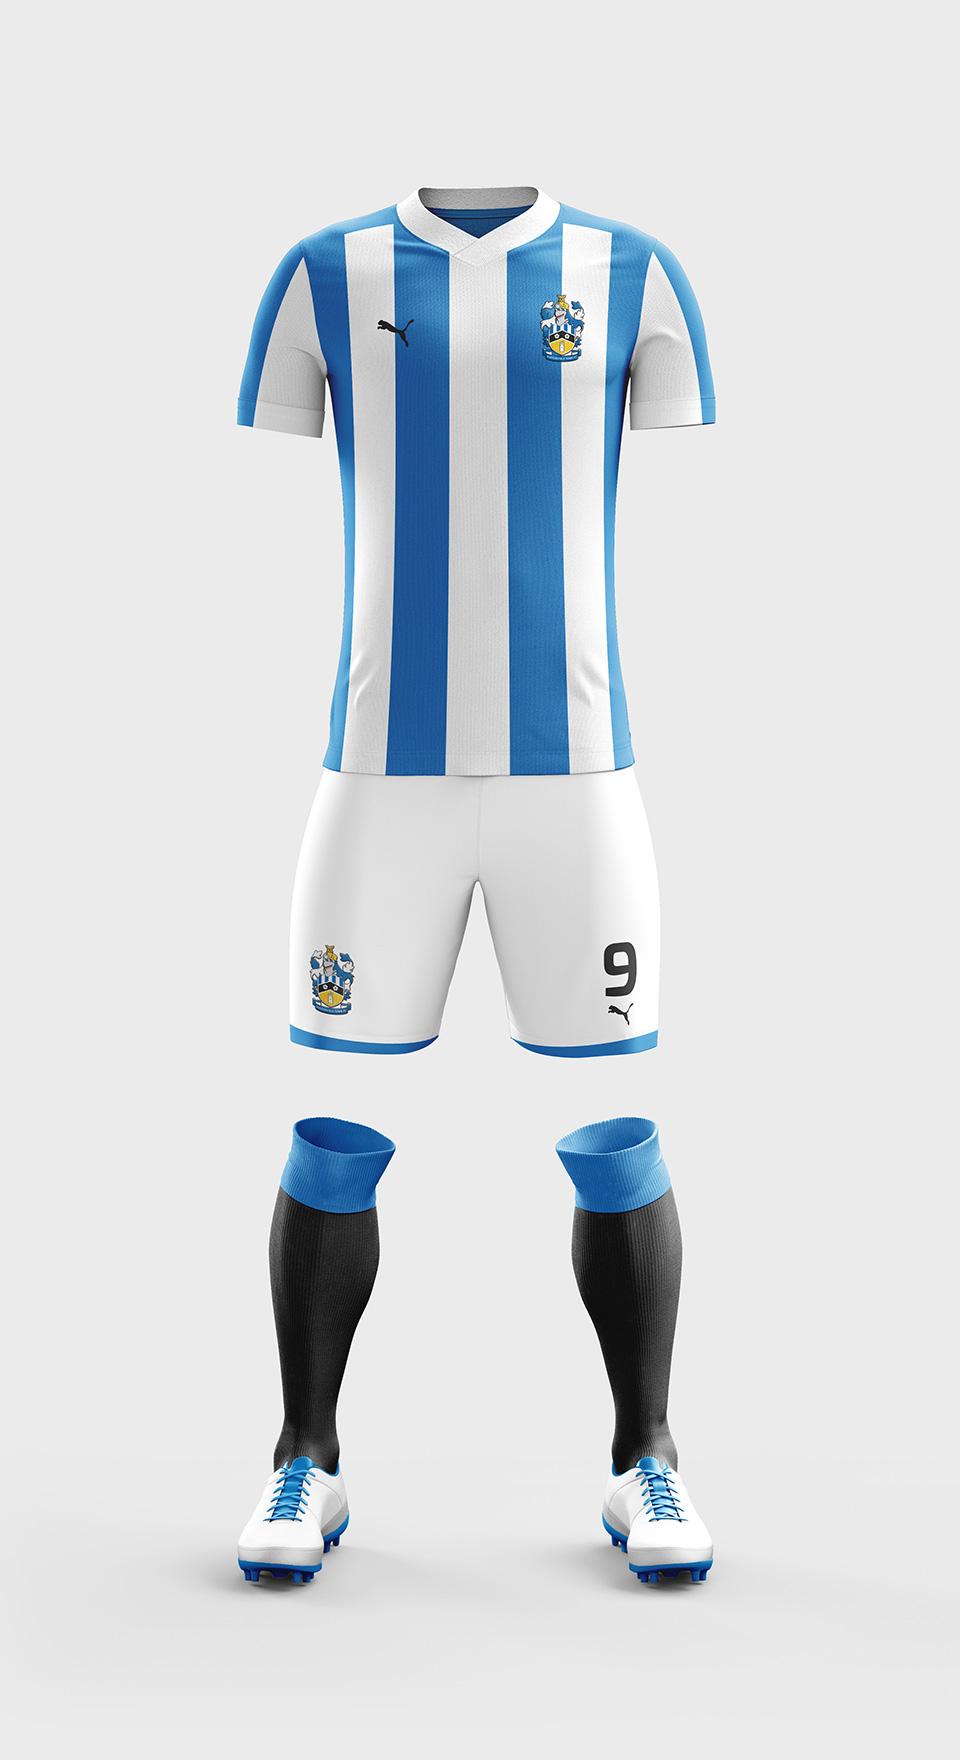 huddersfield town kit design